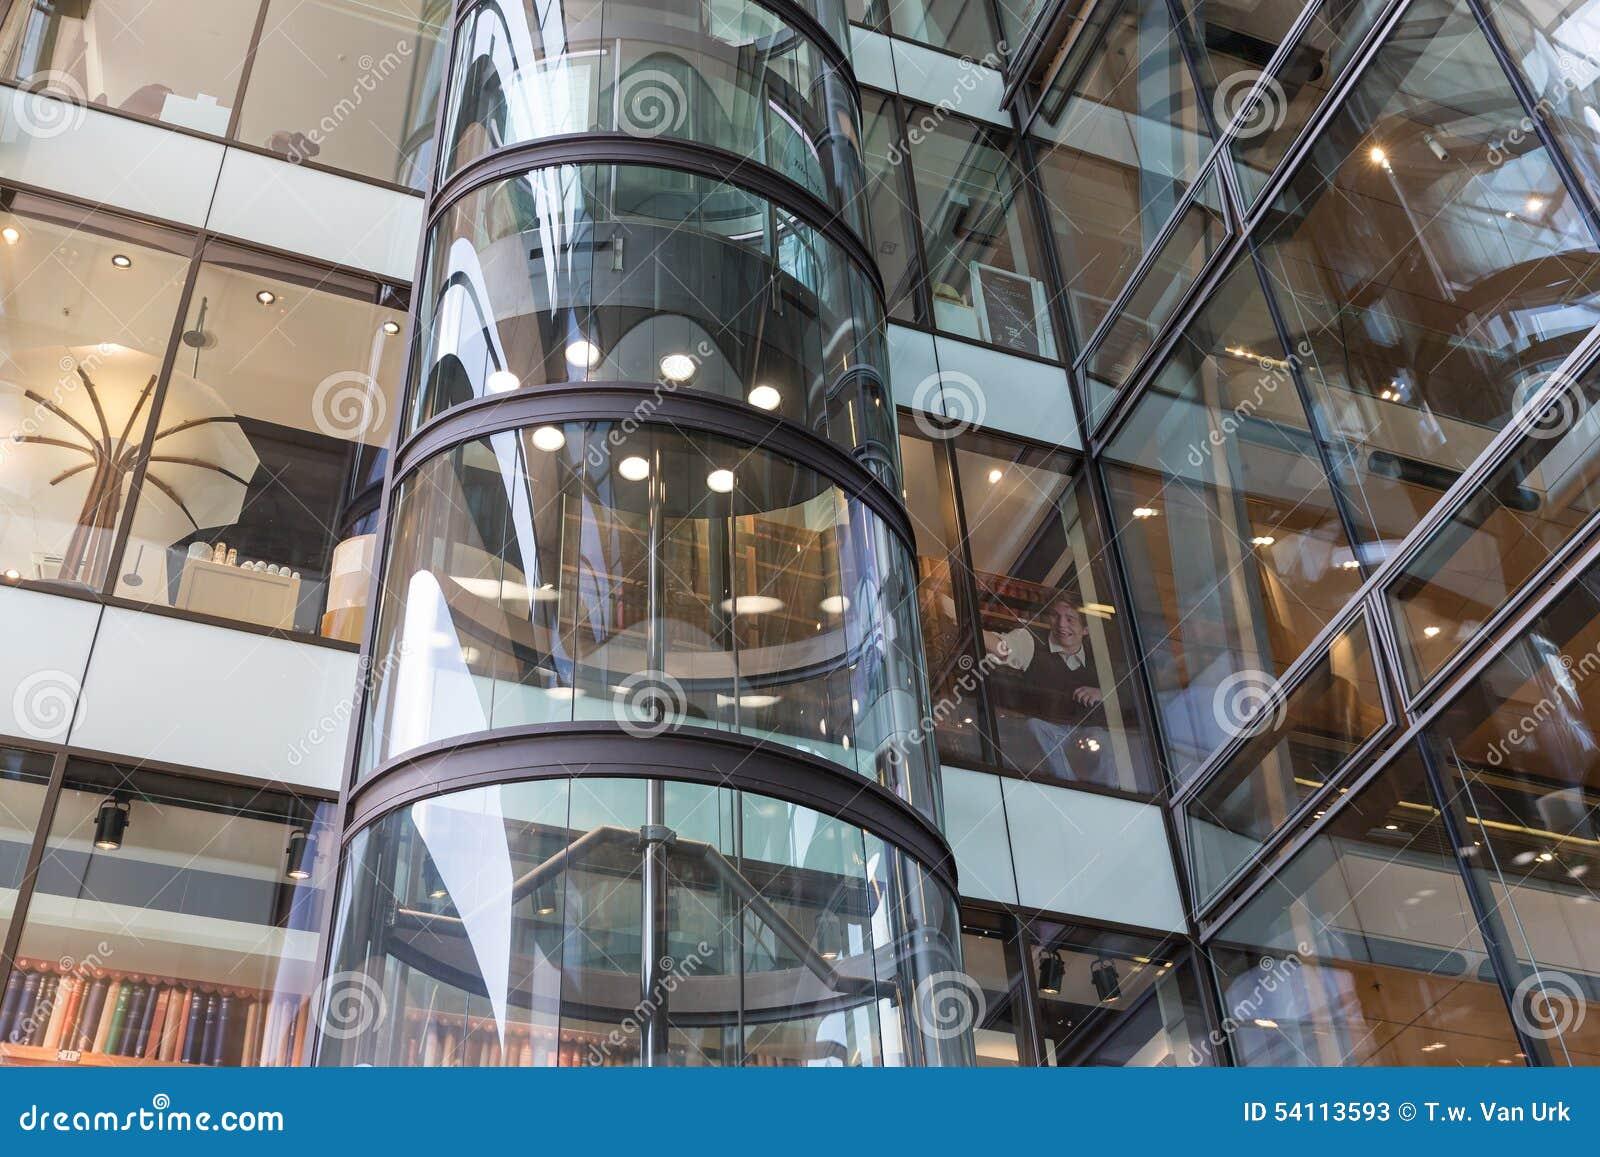 Glass Elevator In Shopping Mall Europassage In Hamburg